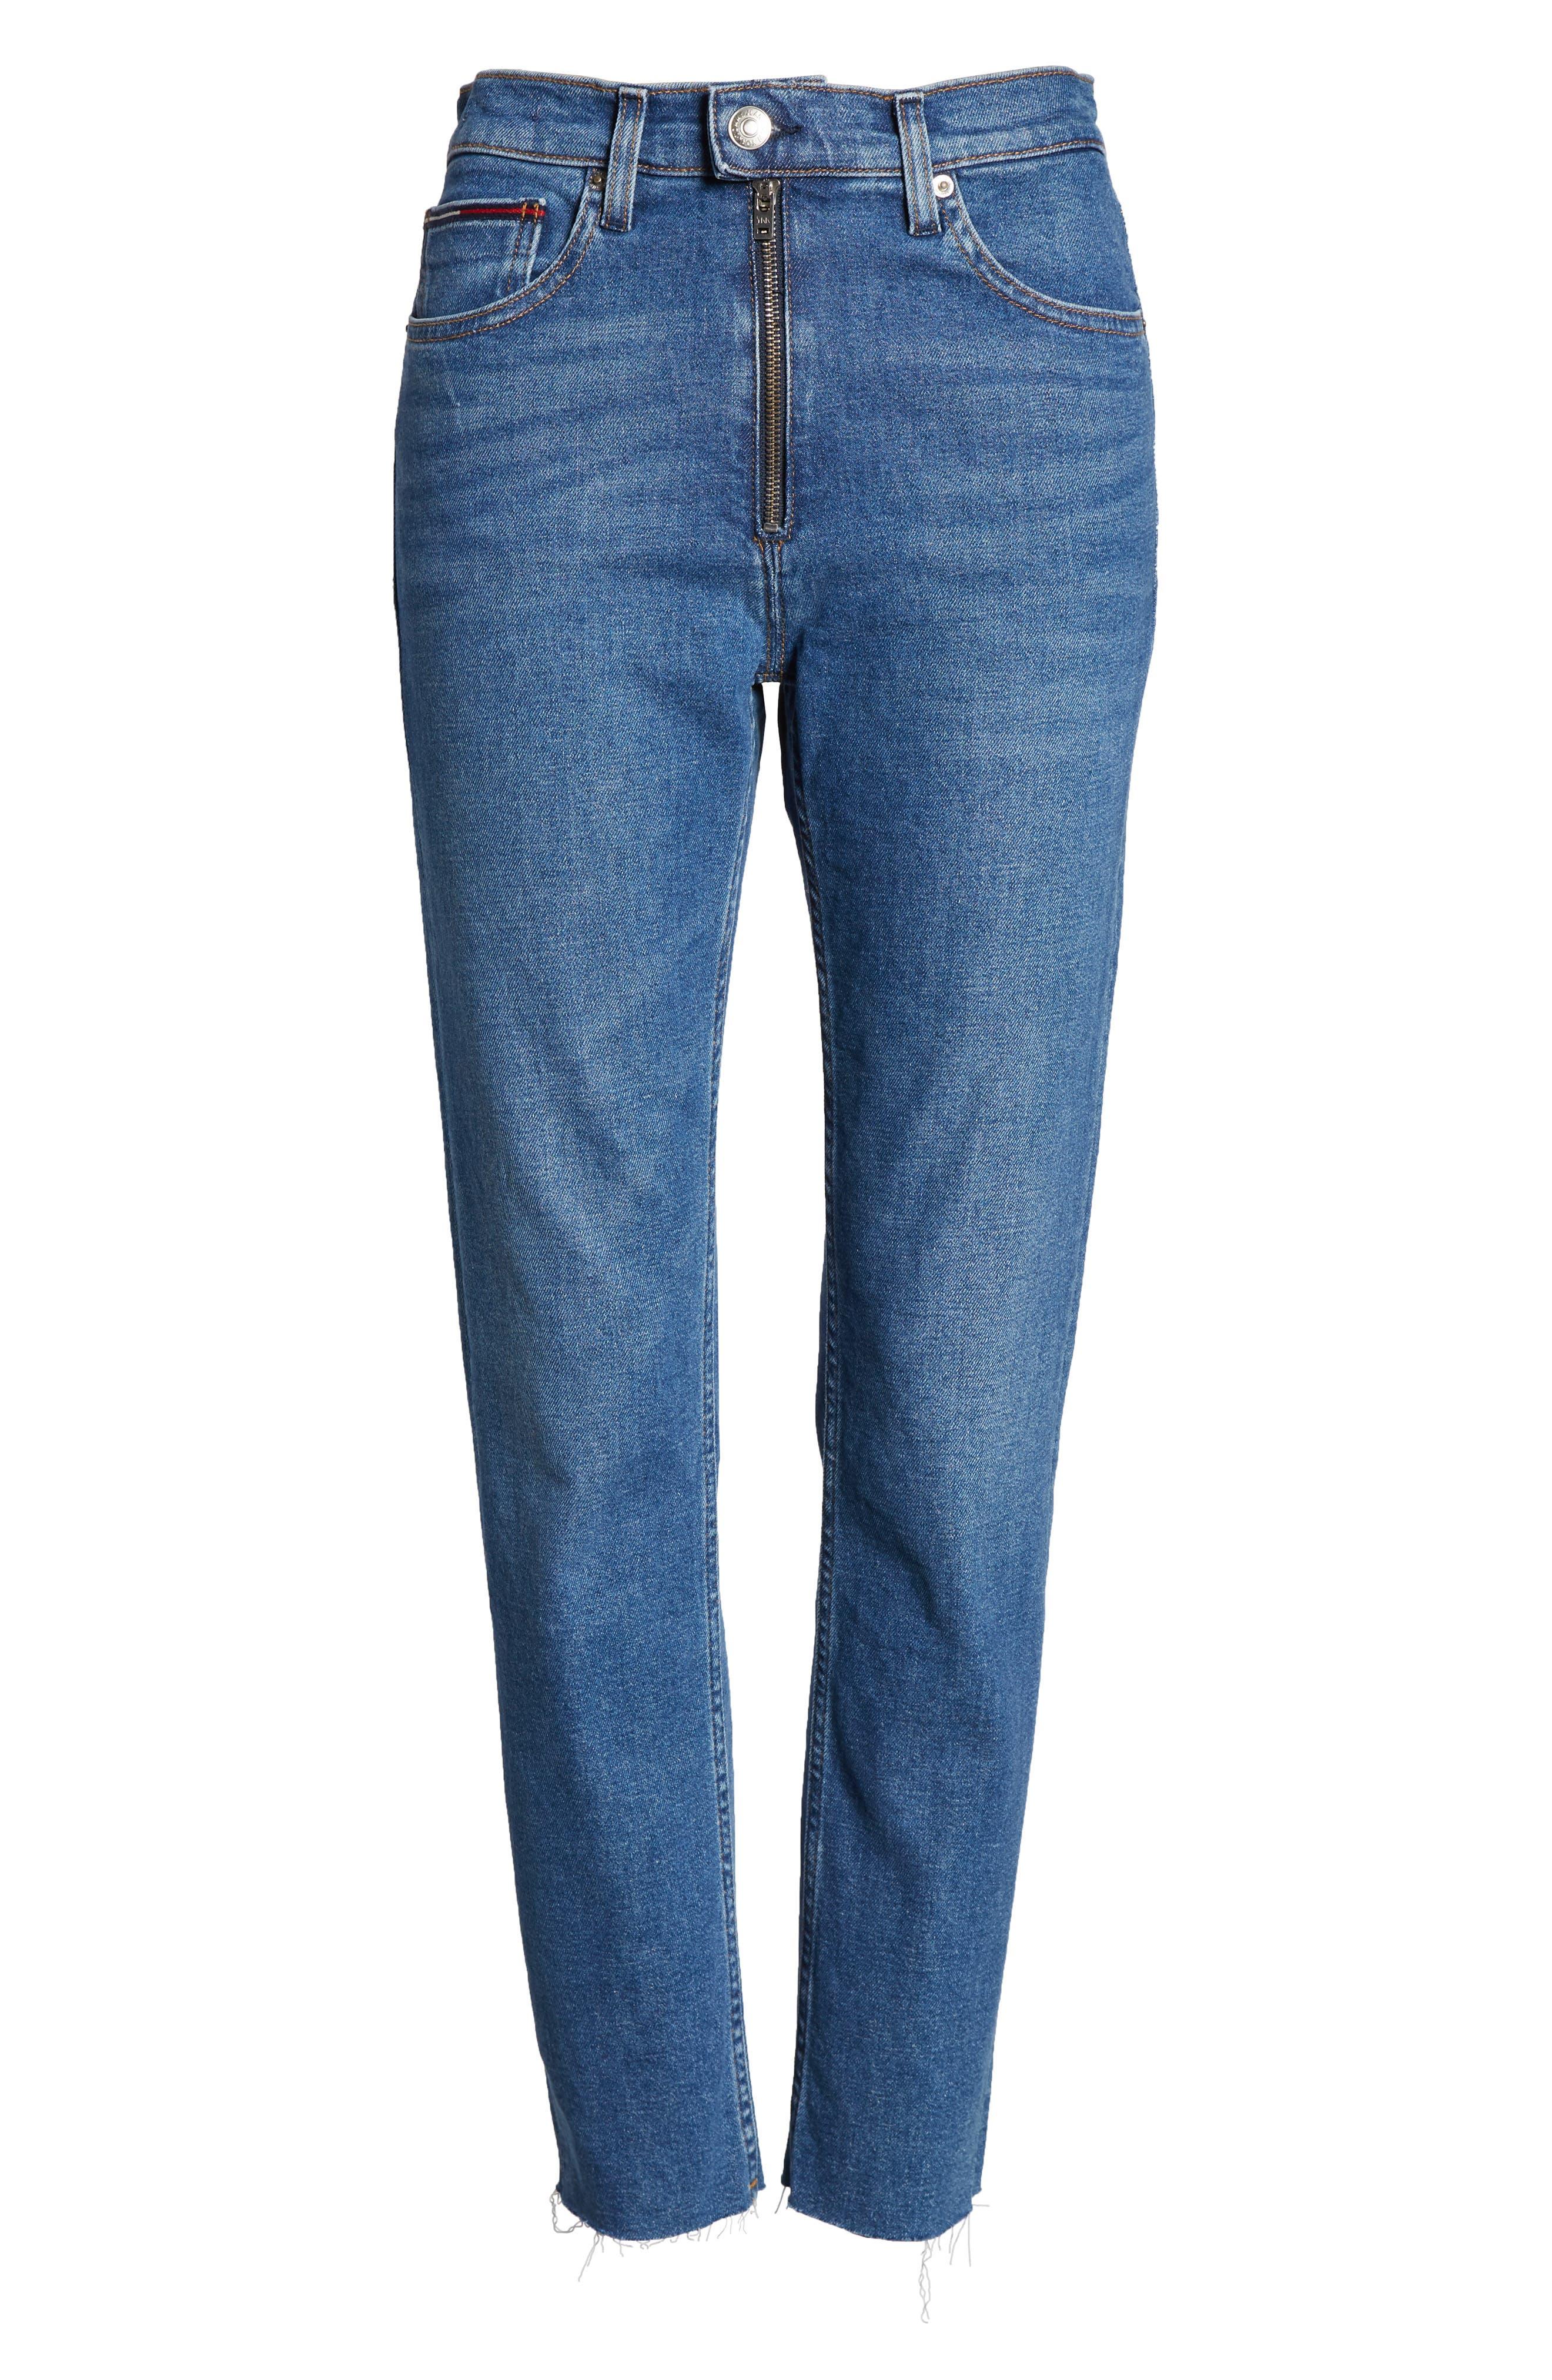 Izzy High Waist Slim Crop Jeans,                             Alternate thumbnail 7, color,                             400